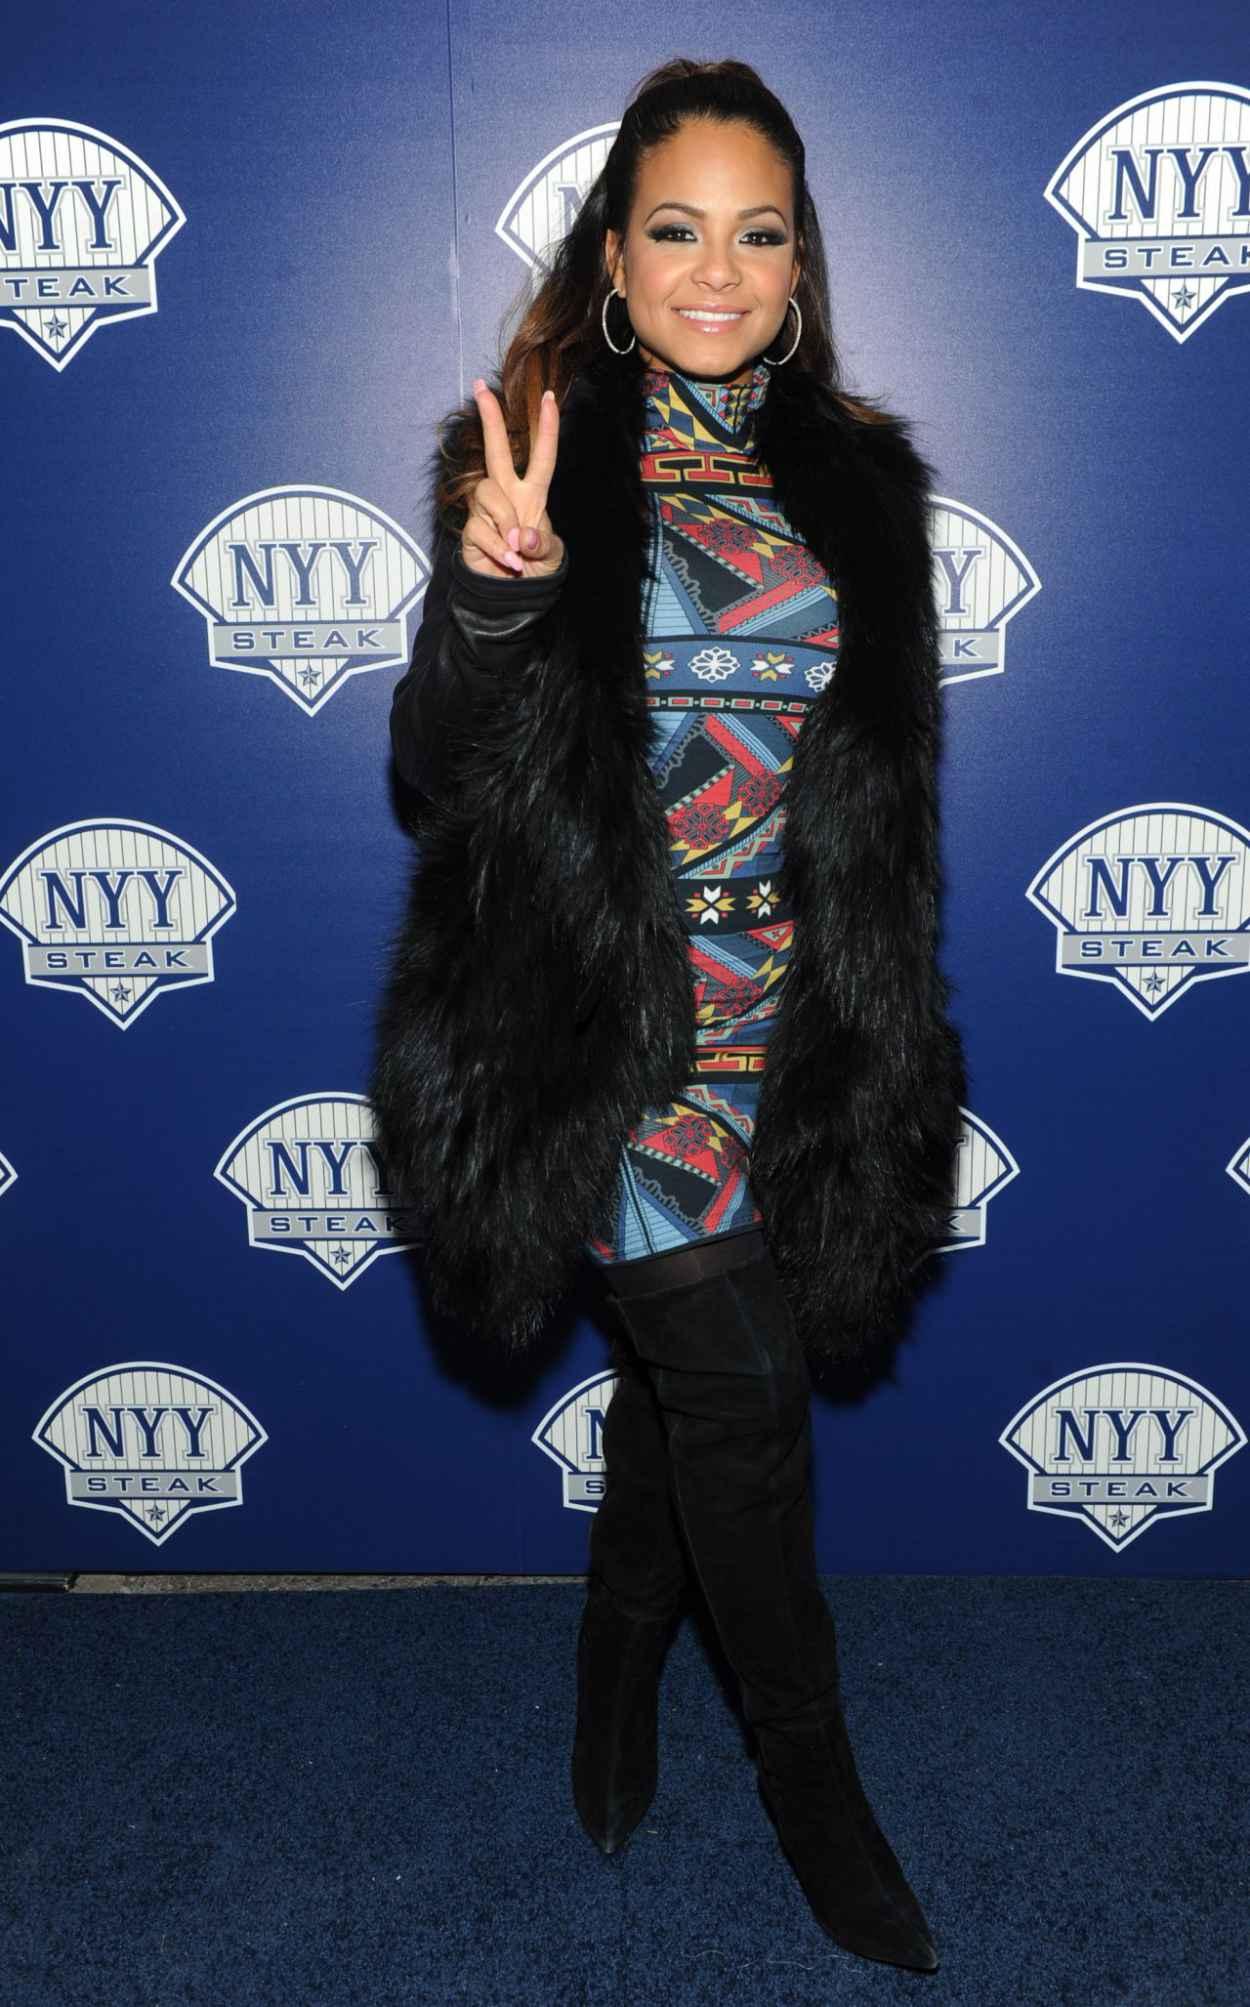 Christina Milian at NYY Steak Manhattan Grand Opening in New York-1